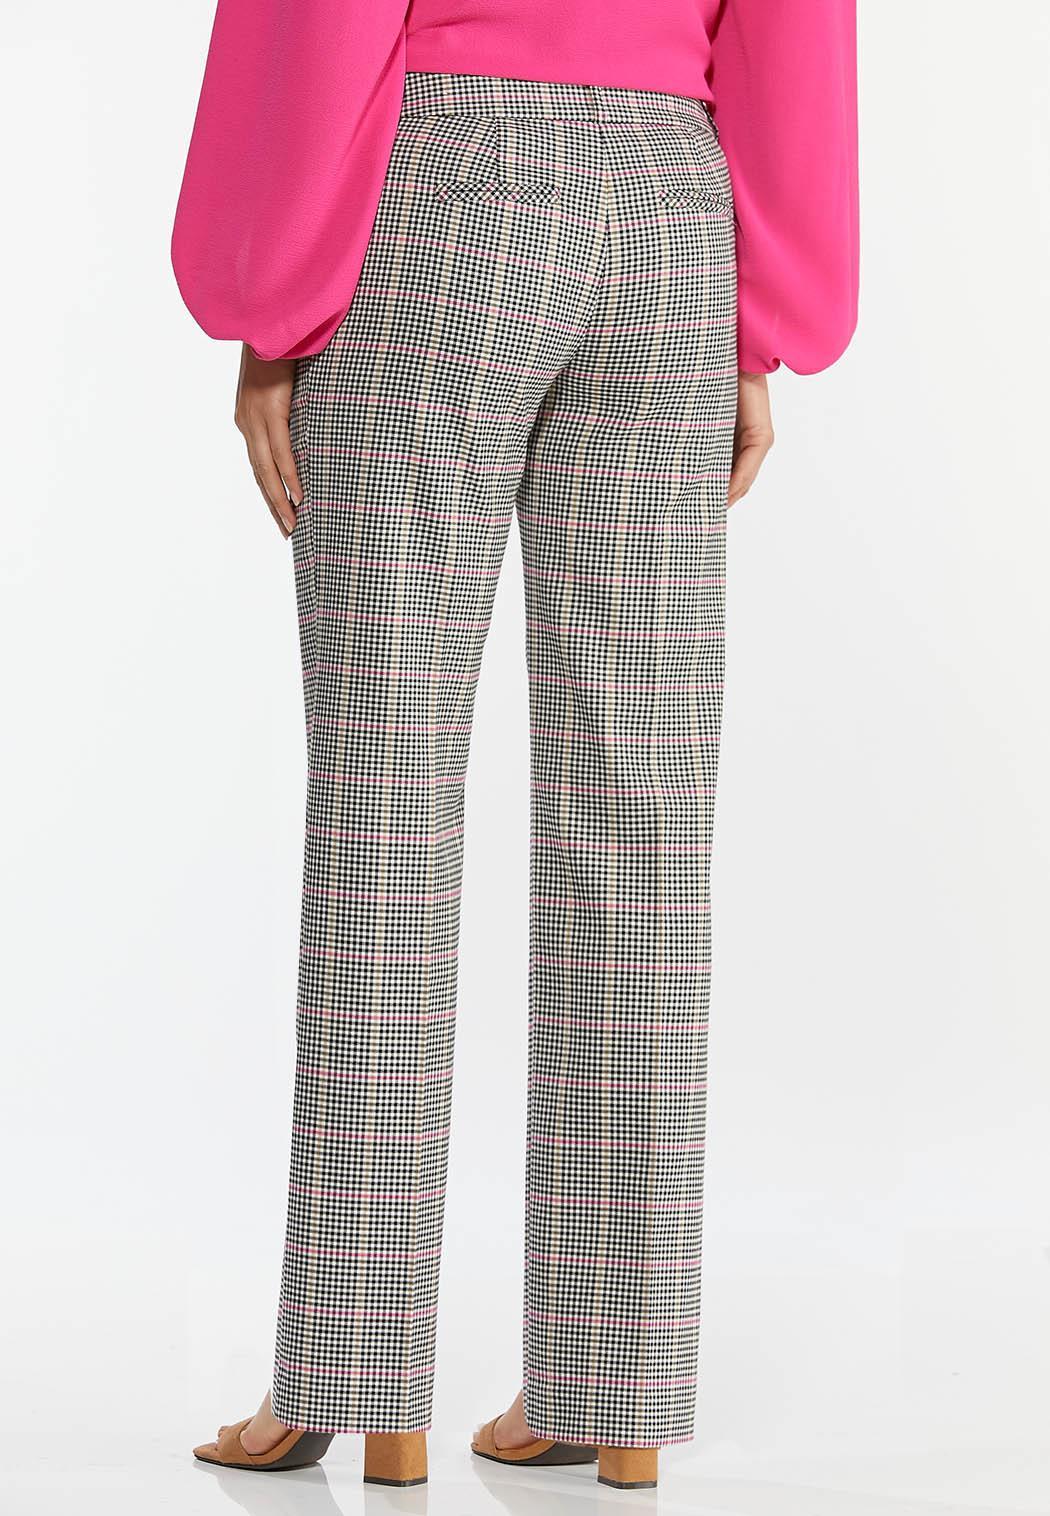 Petite Pink Plaid Trouser Pants (Item #44380907)